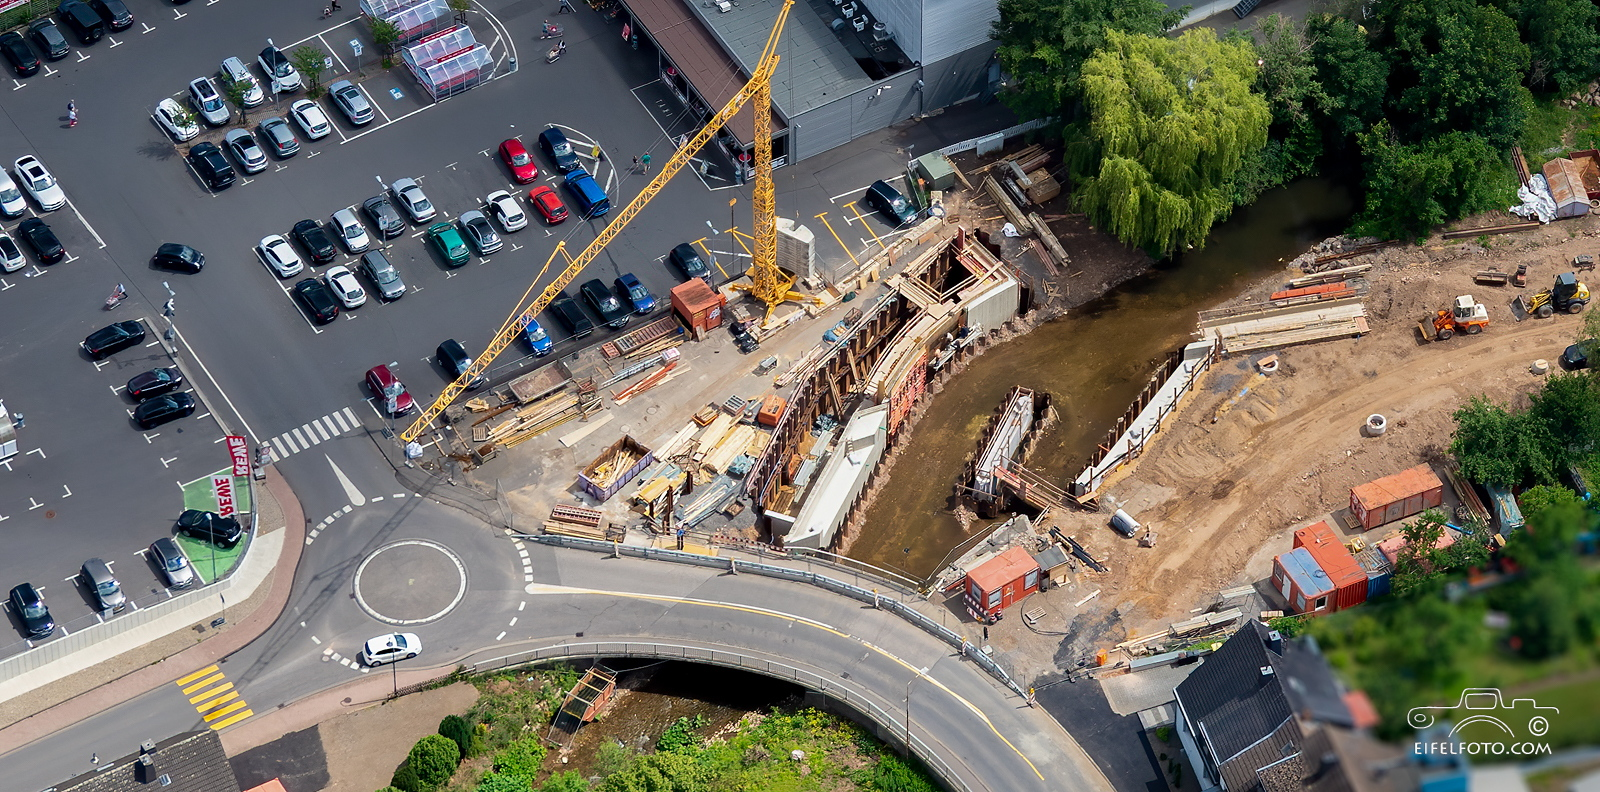 Baustellenfotografie: Brückenarbeiten Kall, 20.06.2020